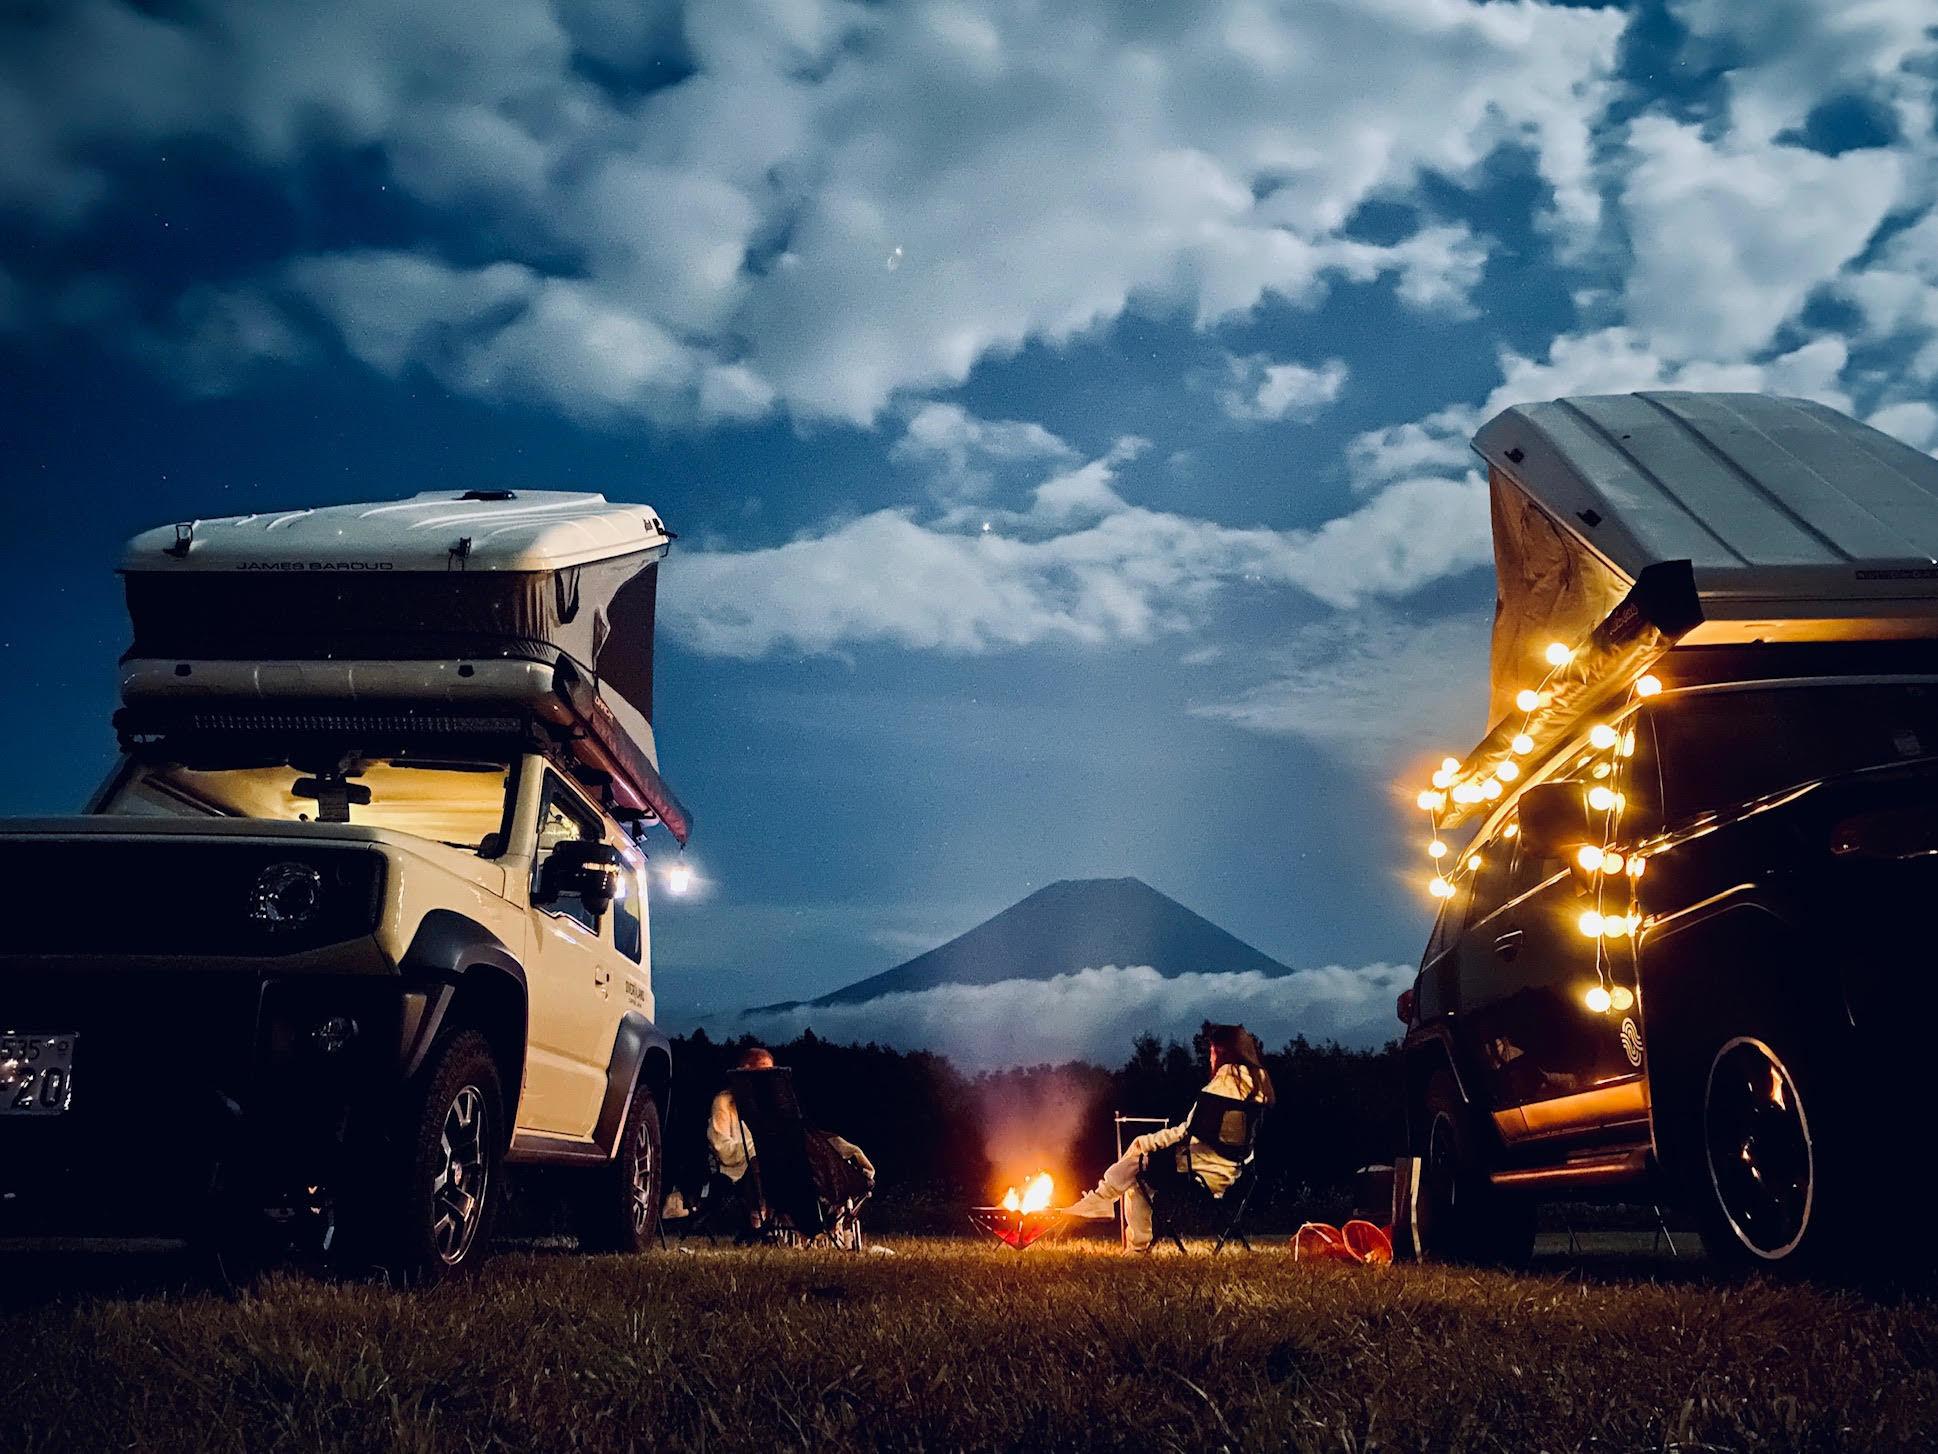 Land campers